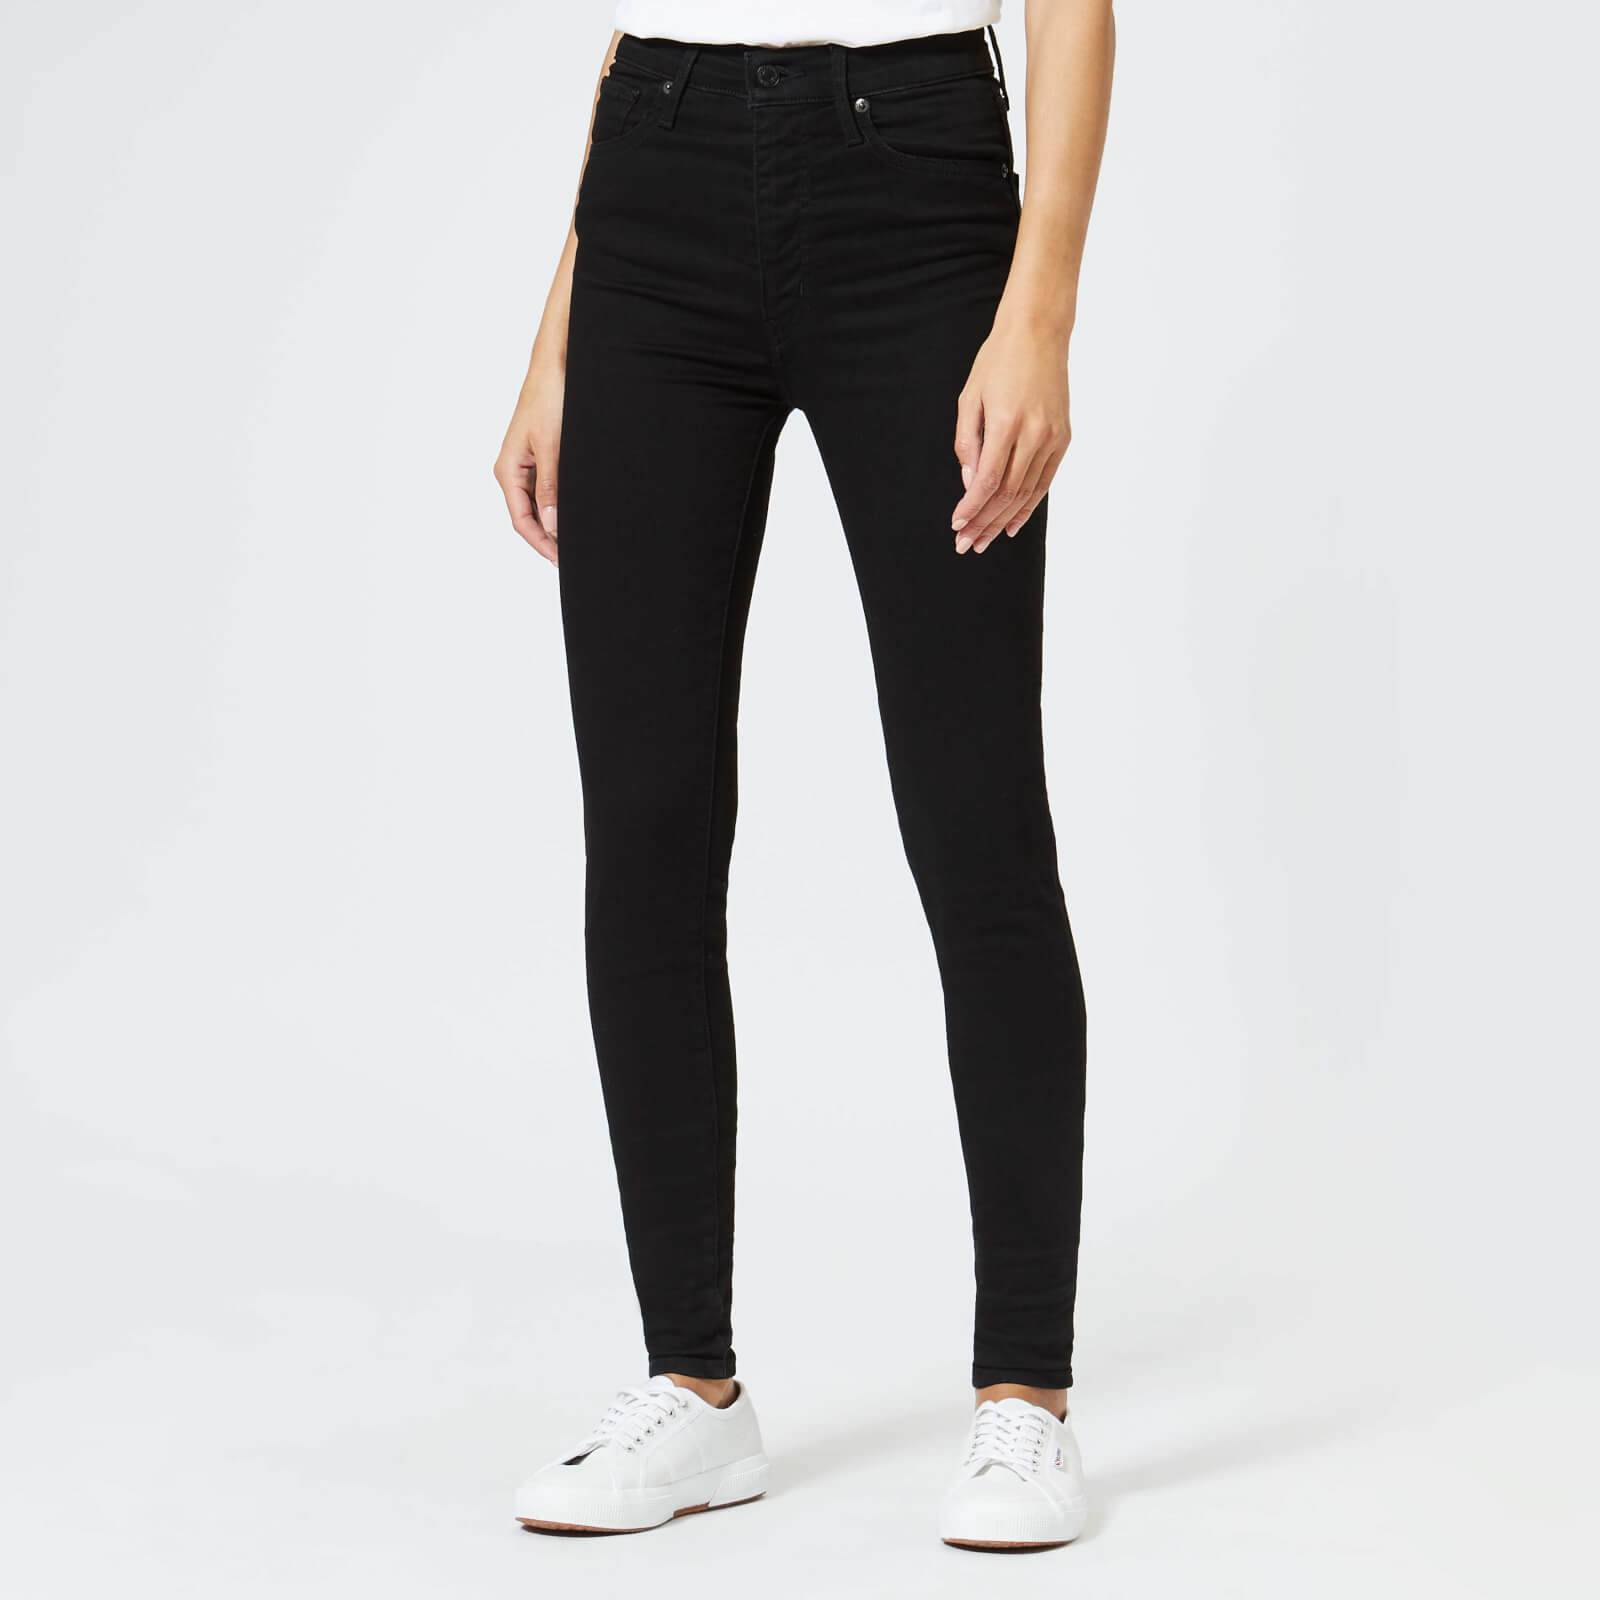 Levi's s Mile High Super Skinny Jeans - Black Galaxy - W30/L32